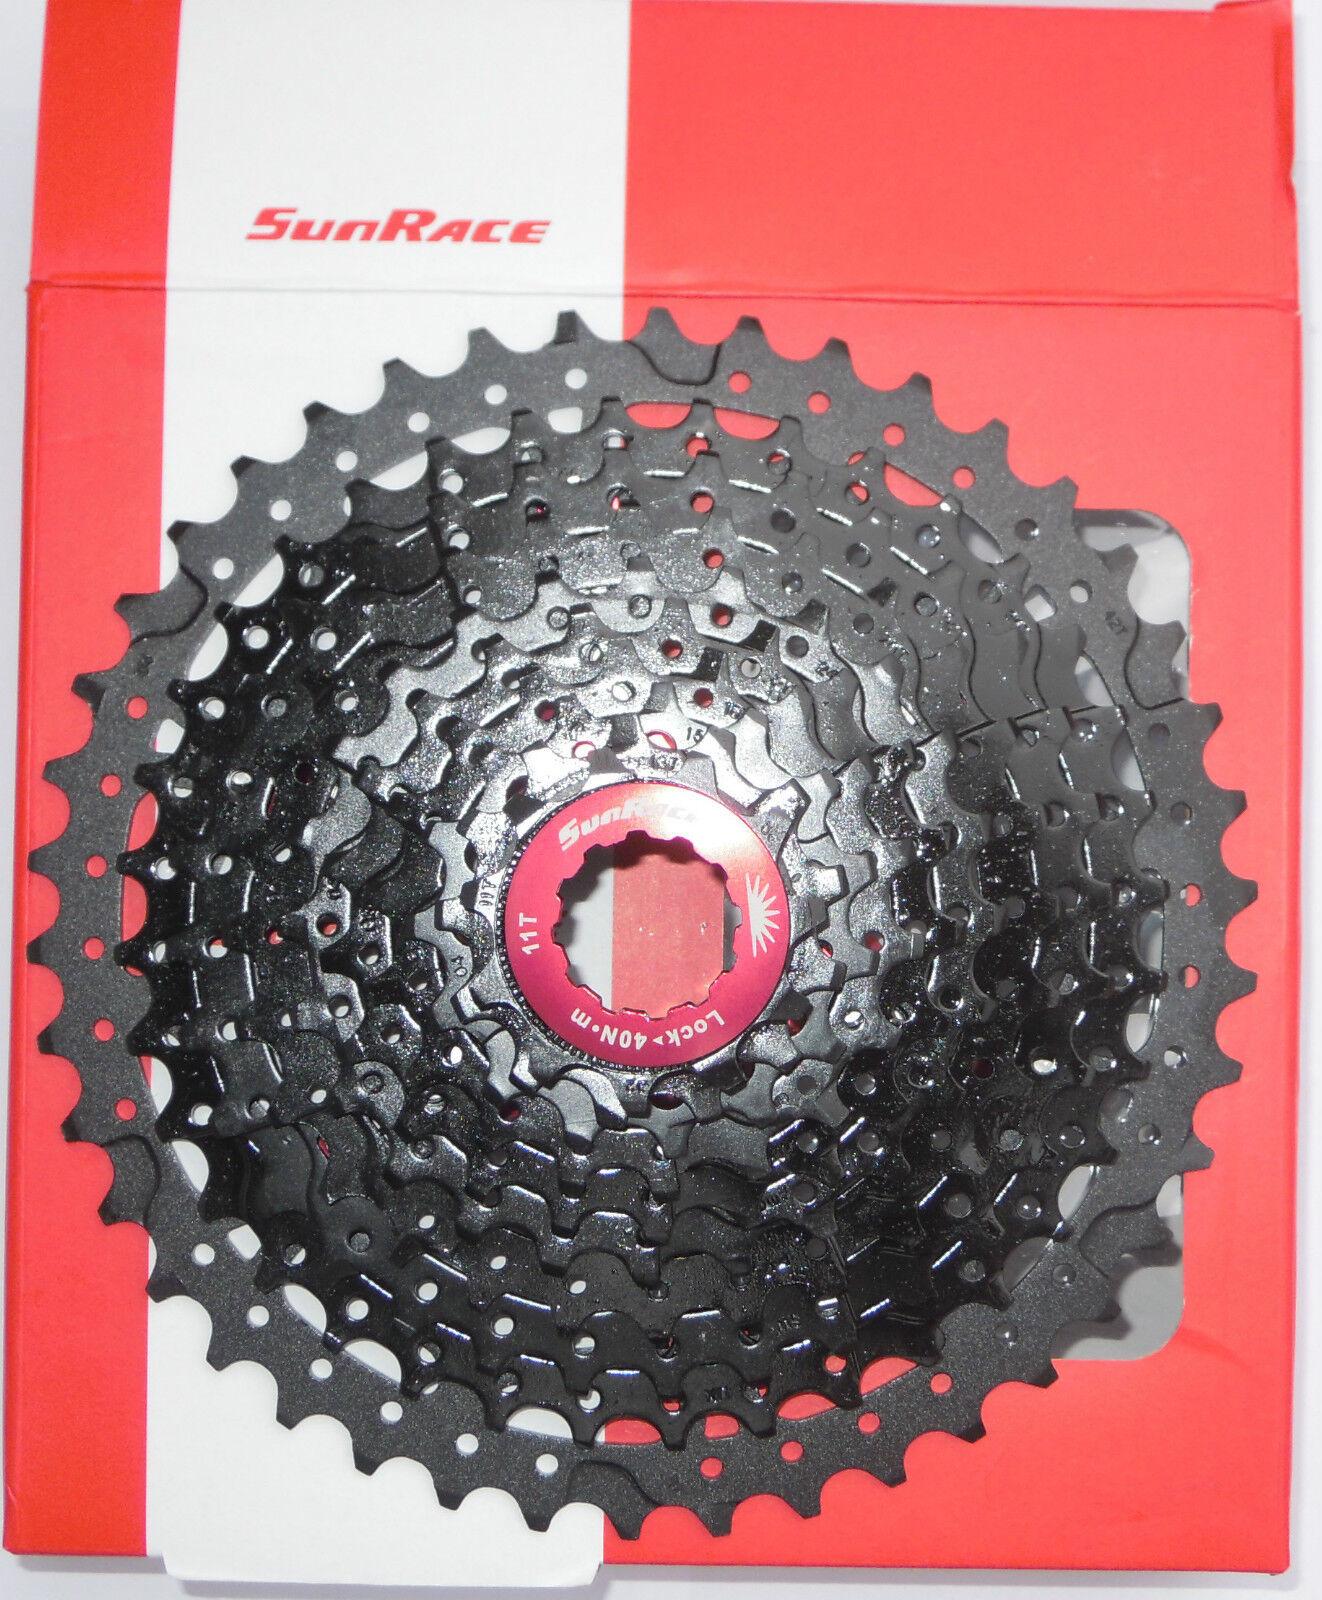 SunRace - Kassette Aluminium MX3 MX3 MX3 11-42T 11-46T schwarz rot schwarz rot 10s b 33c24c